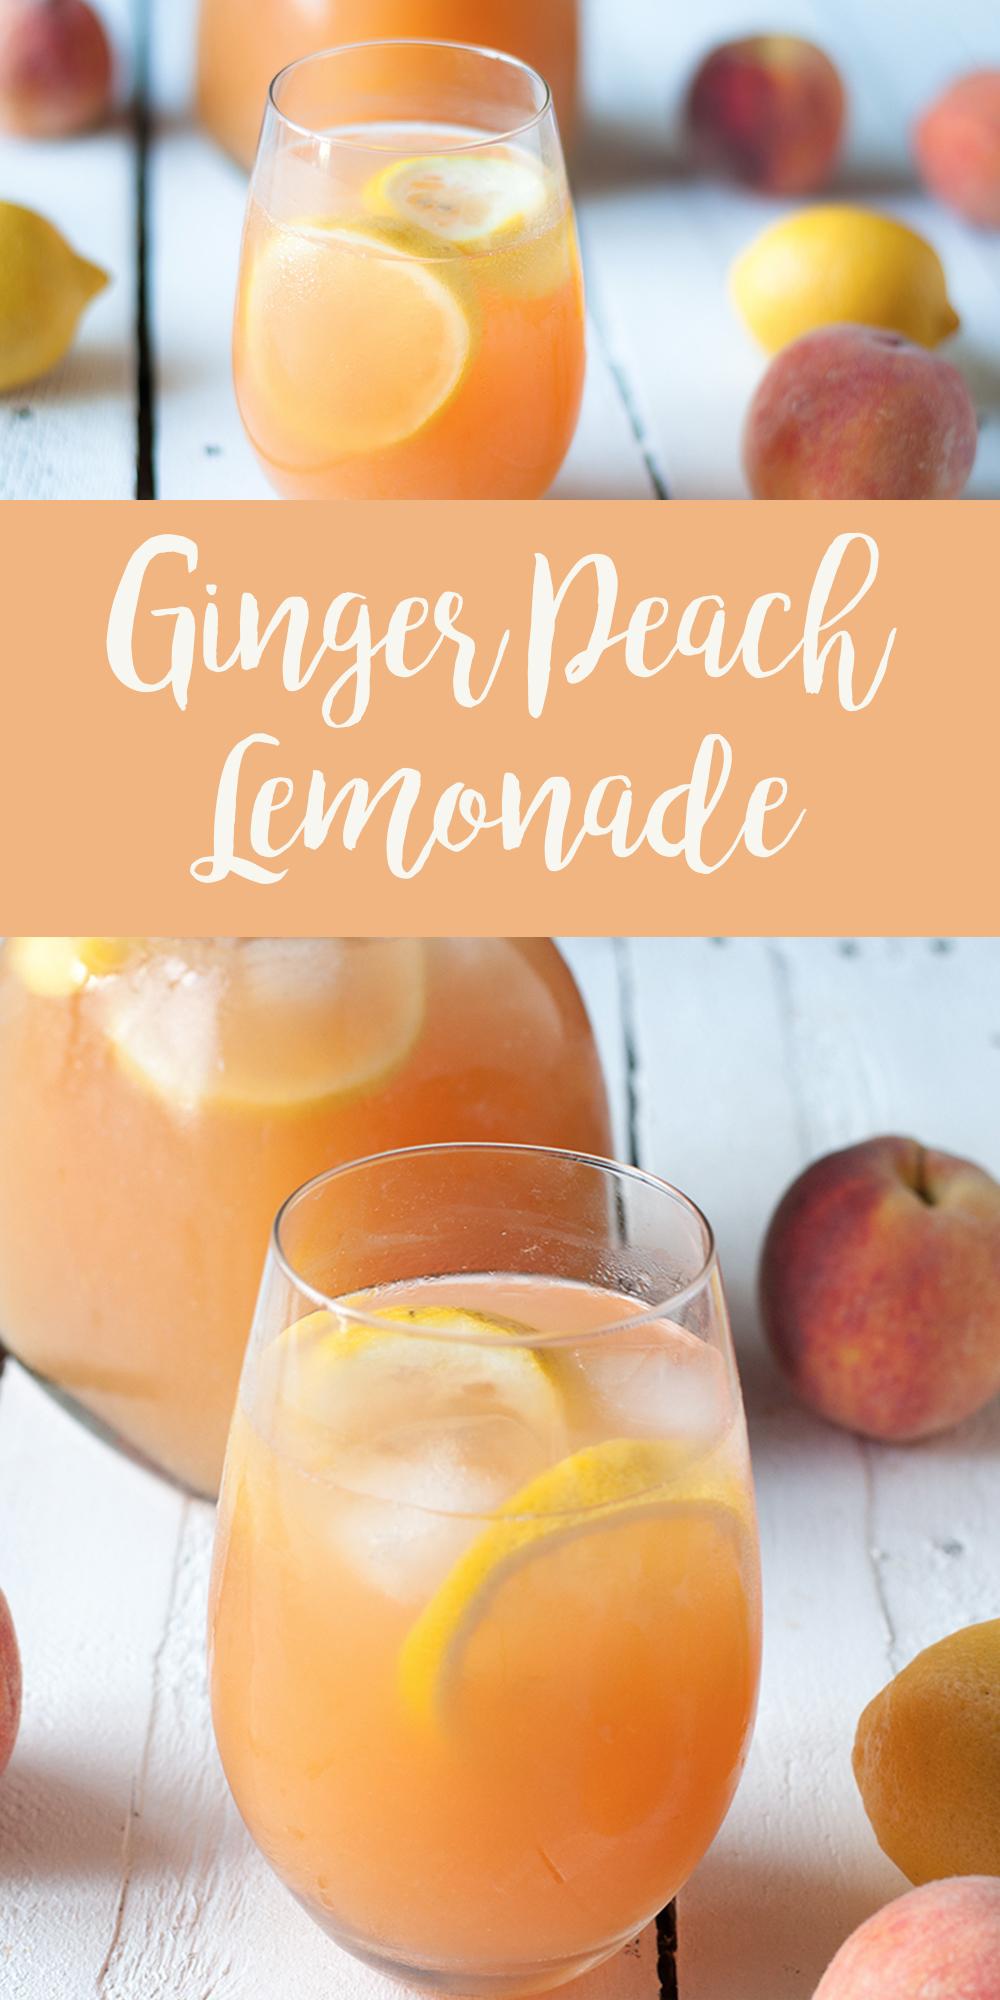 Enjoy a glass of this refreshing Ginger Peach Lemonade on a hot summer day! #Peach #Recipe #Drink #Beverage #Ginger #vegan #plantbased #summer  #laborday #lemon